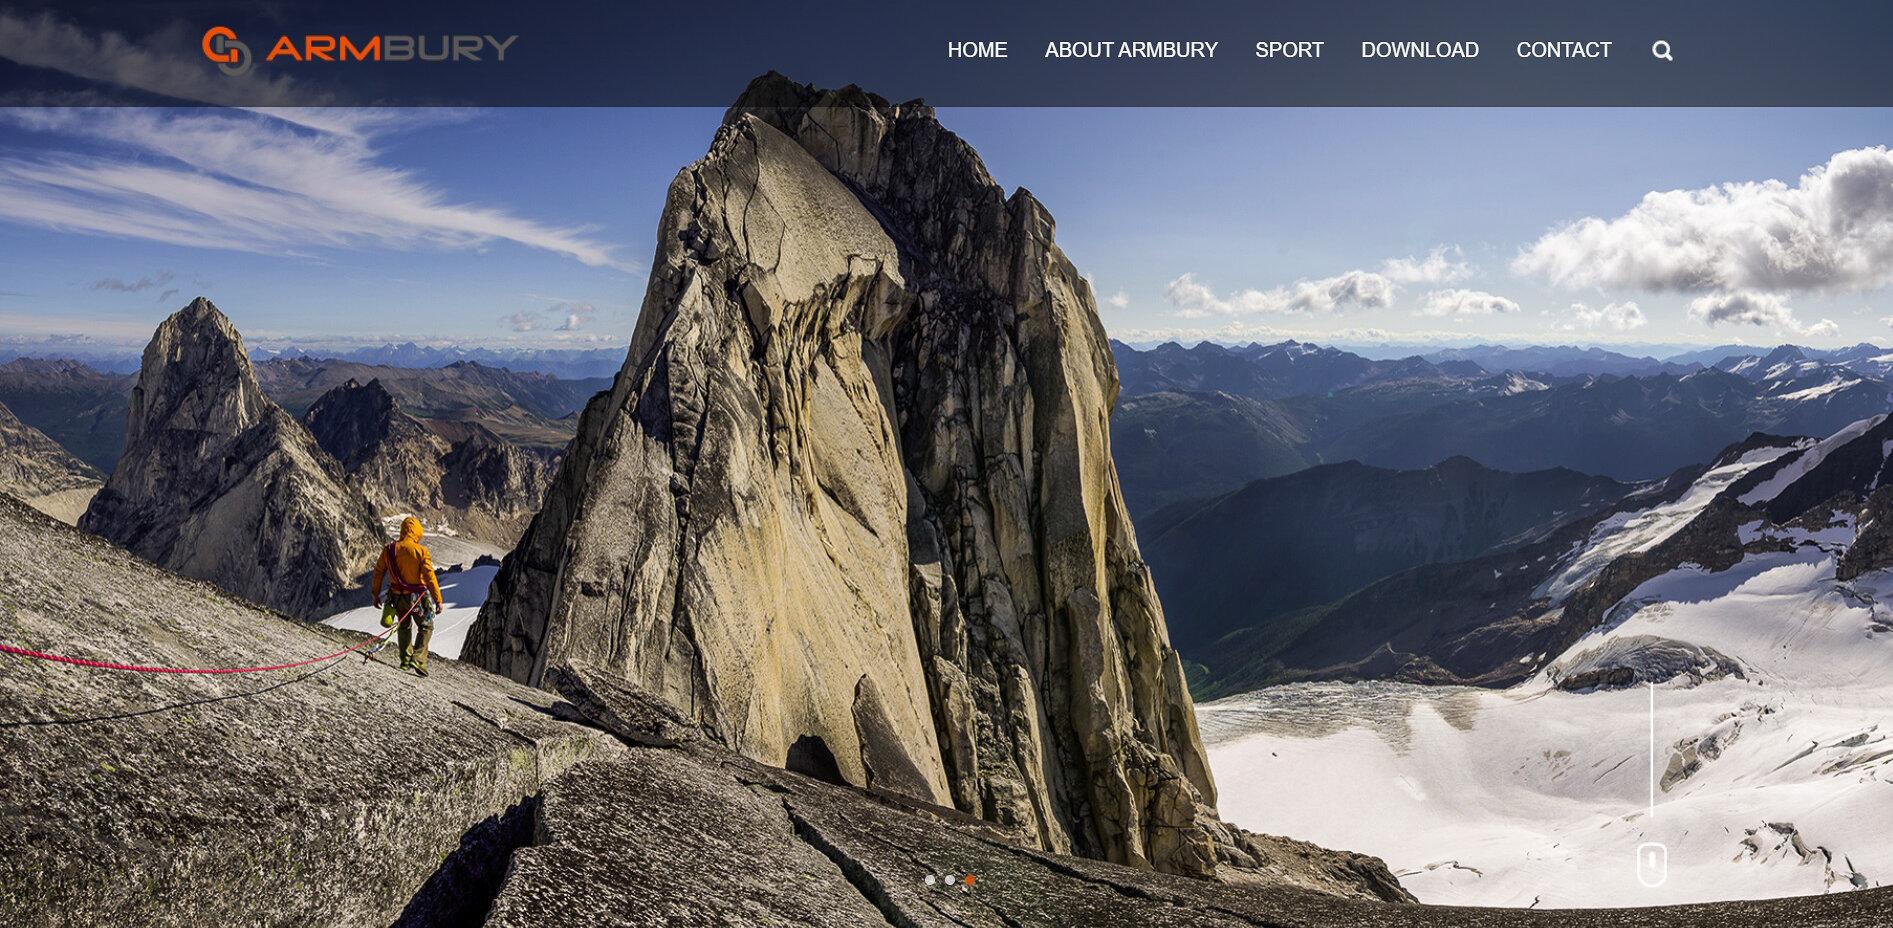 Armbury Homepage 1-2.JPG